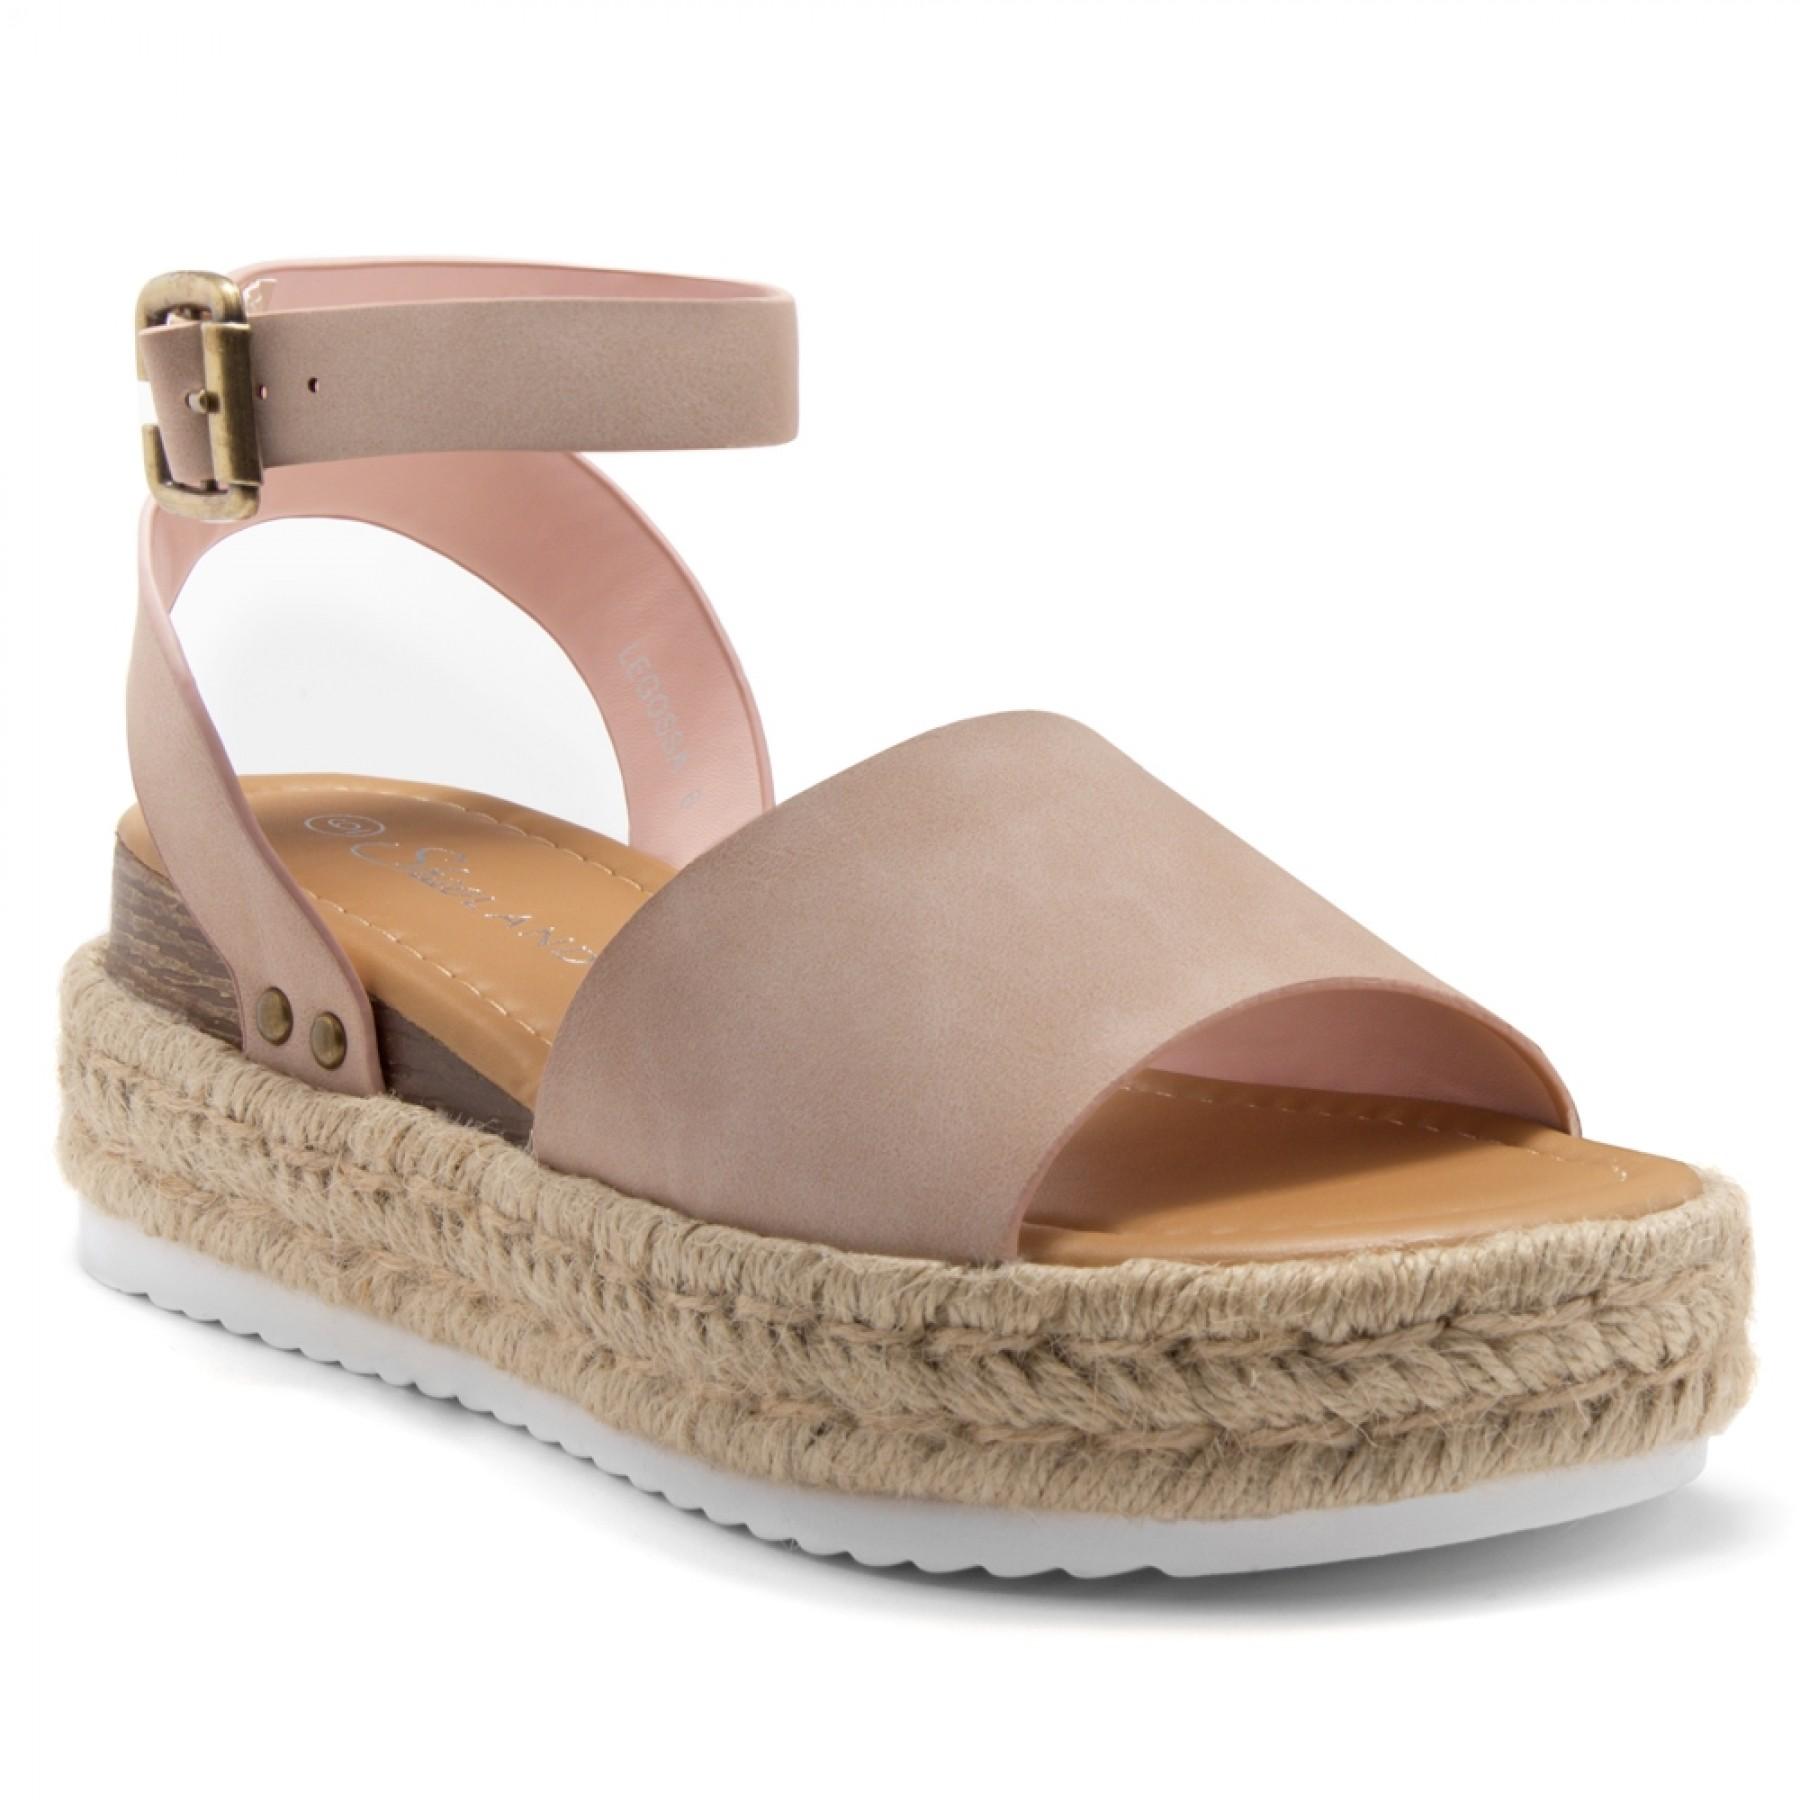 Shoe Land Legossa-Women's Open Toe Ankle Strap Platform Wedge Shoes Casual Espadrilles Trim Flatform Studded Wedge Sandals (1825/Mauve)